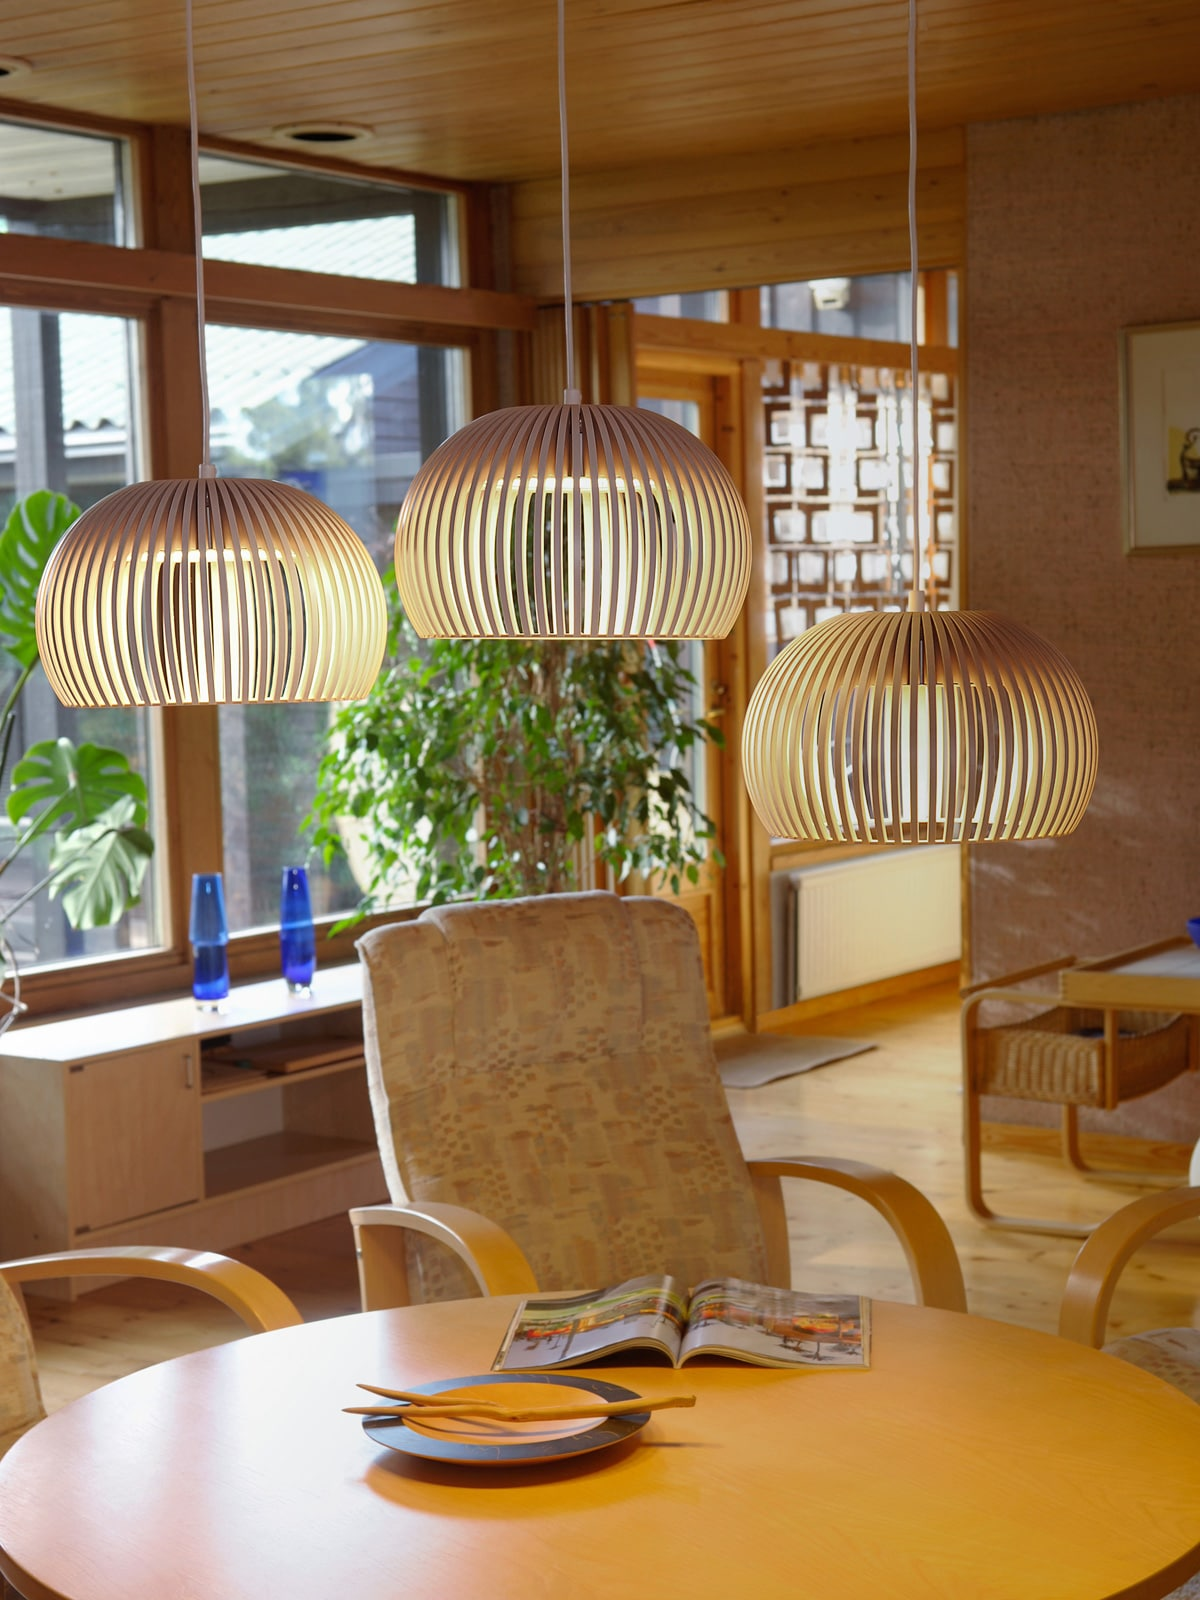 designerleuchten aus naturmaterialien lampen leuchten. Black Bedroom Furniture Sets. Home Design Ideas